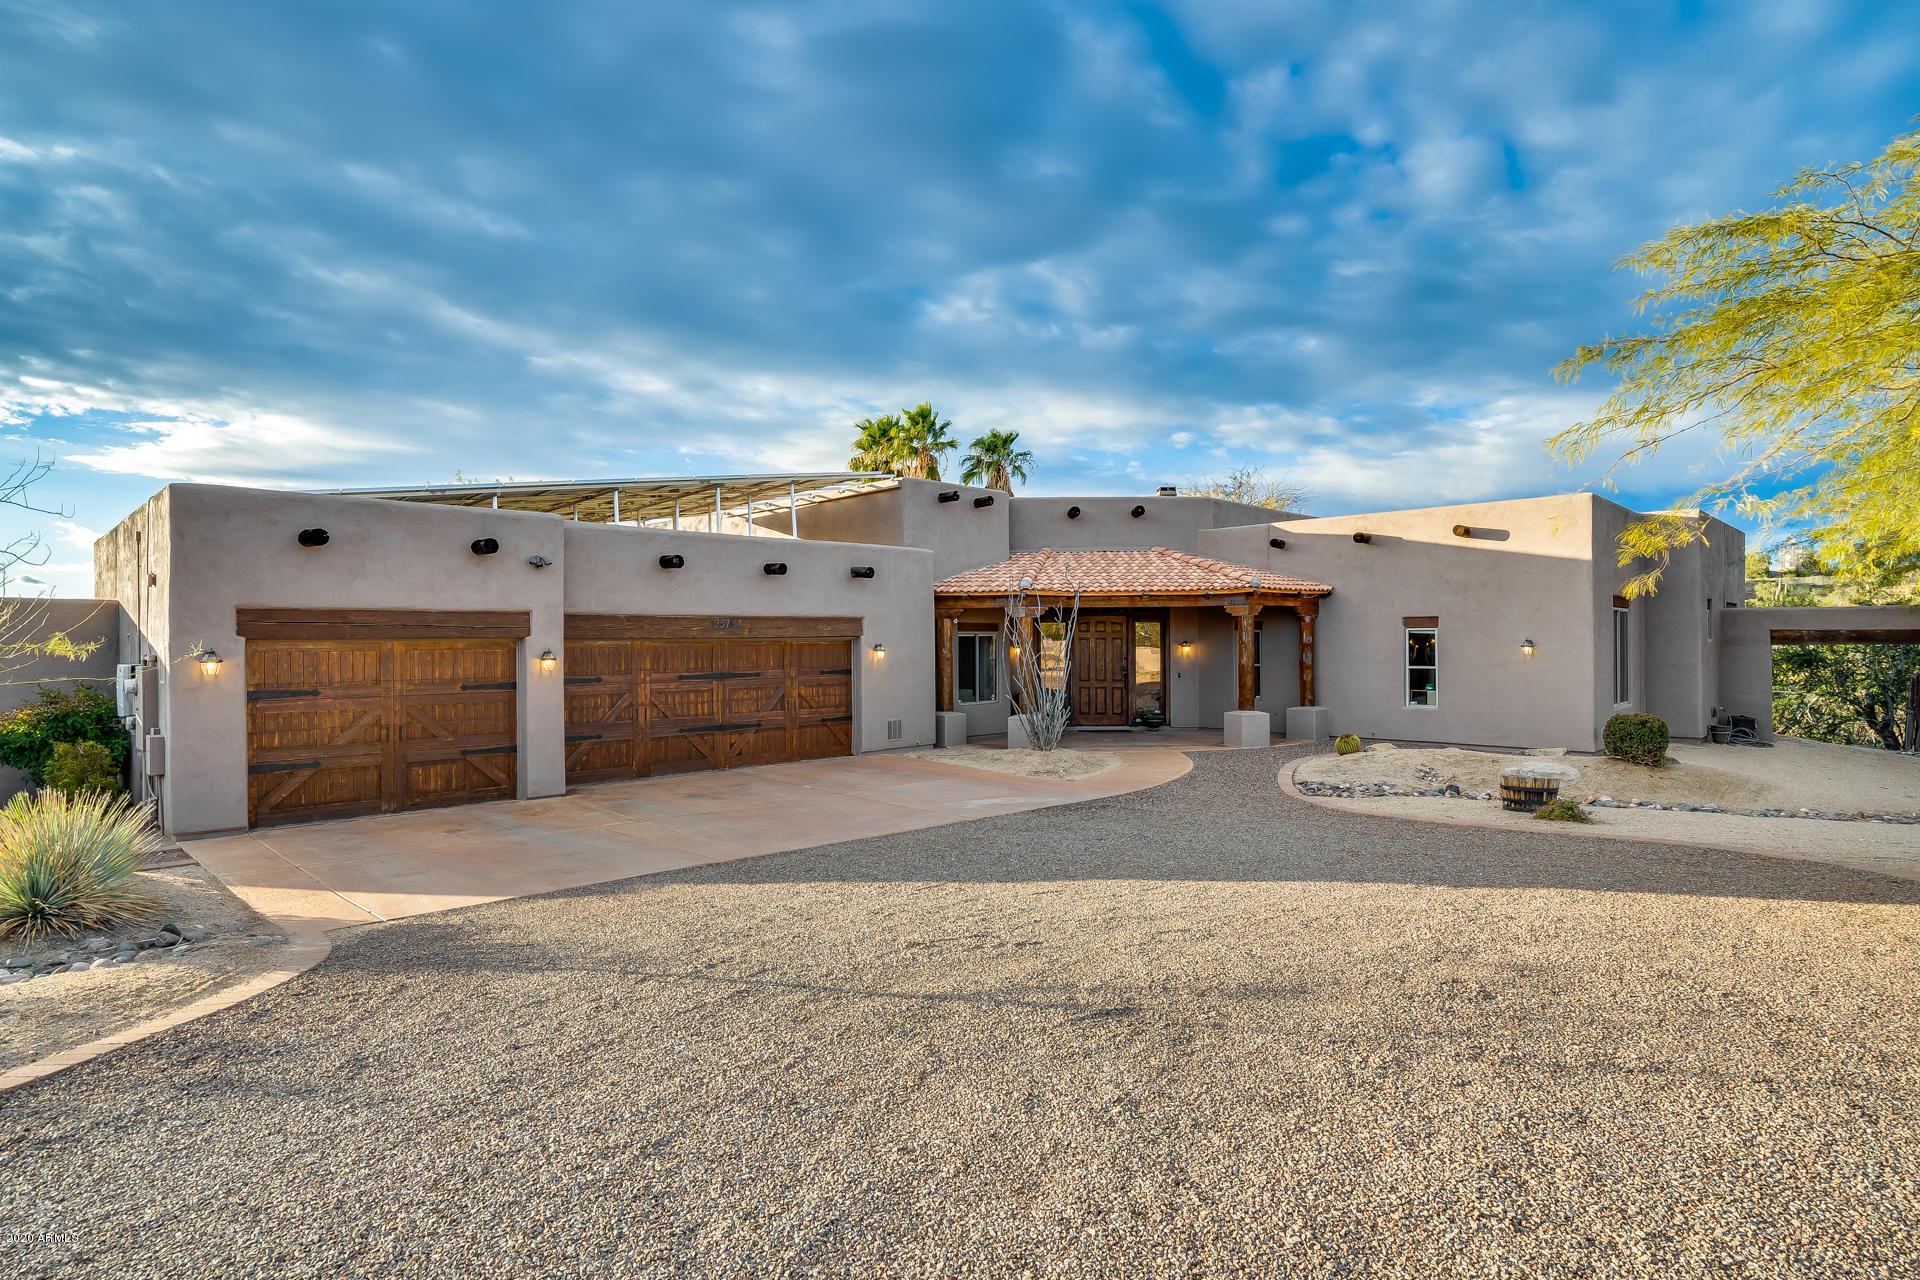 MLS 6078222 25754 N 93RD Avenue, Peoria, AZ 85383 Peoria AZ Four Bedroom